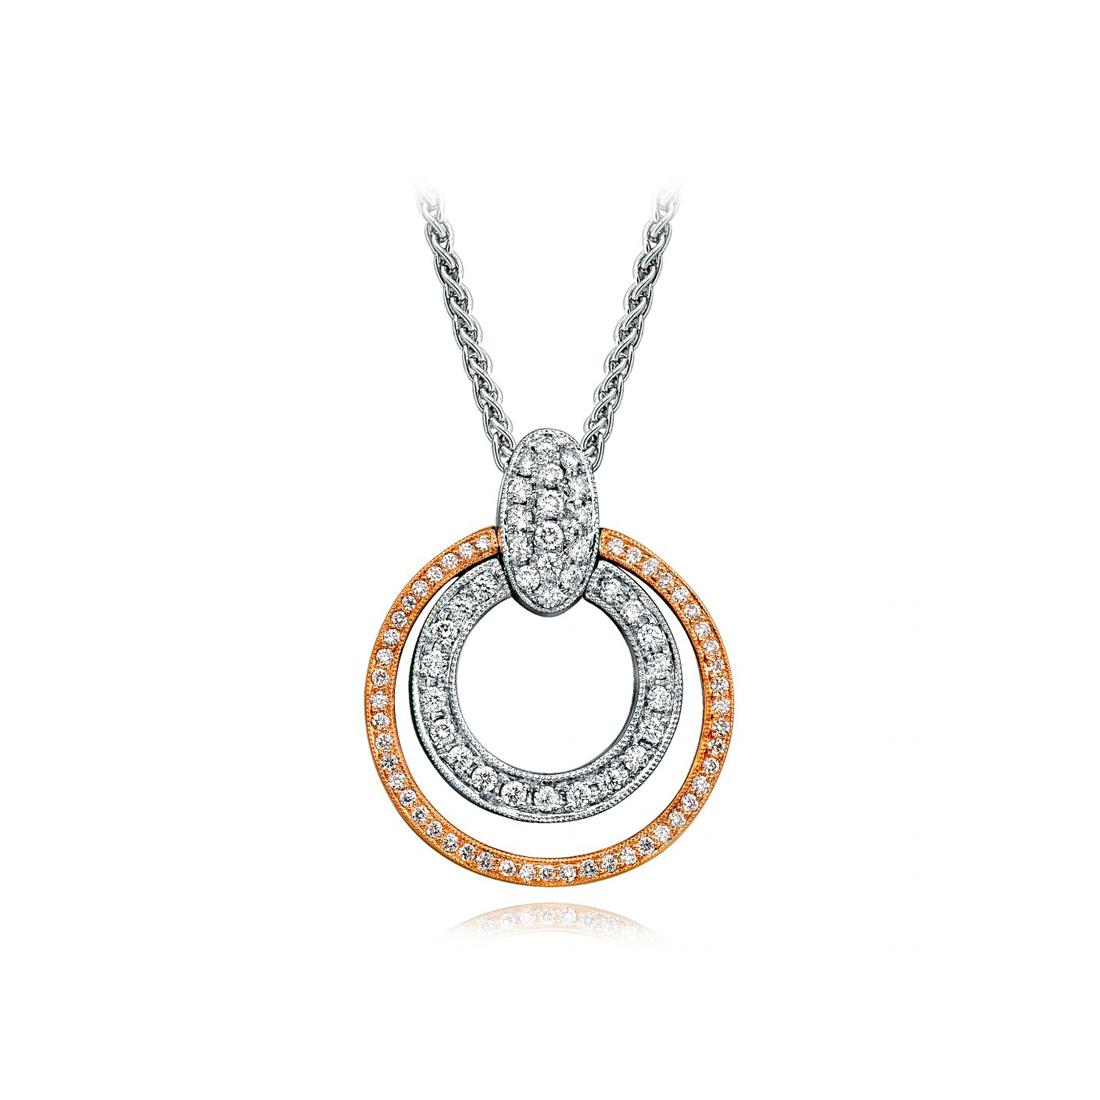 Simon g two tone double circle pendant beifeld jewelers simon g two tone double circle pendant aloadofball Image collections